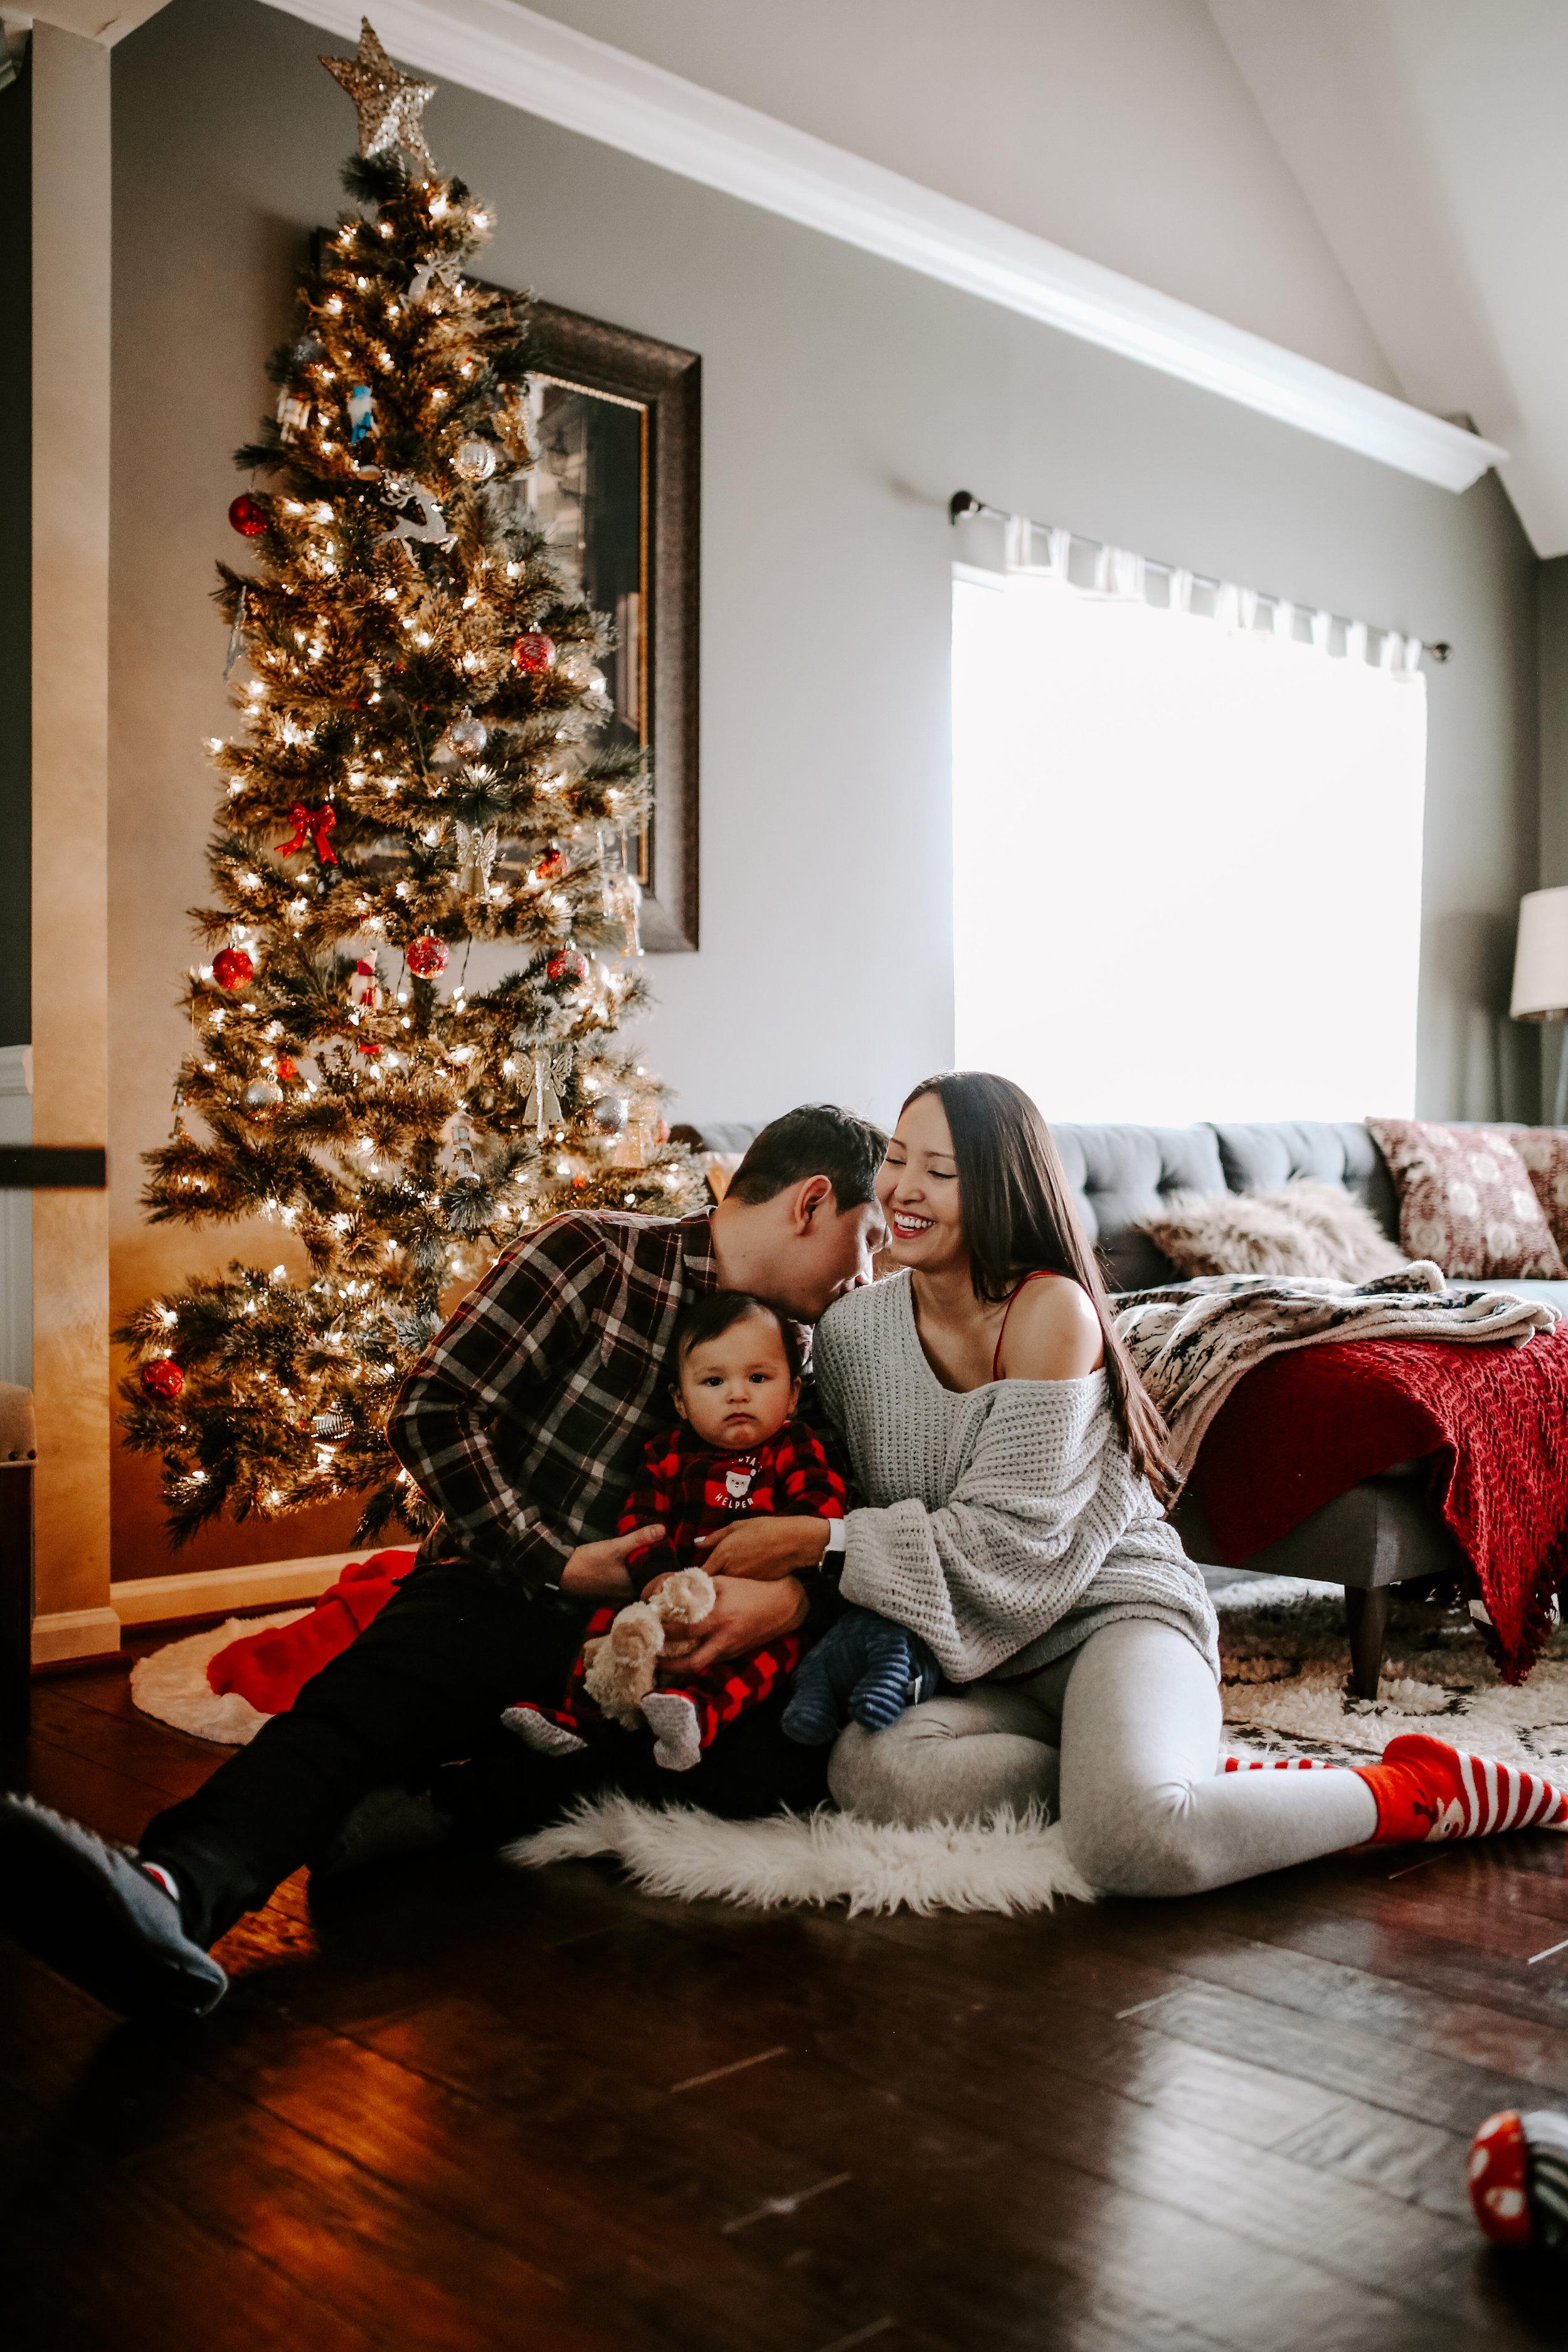 Camacho's_Christmas_2018-7.jpg